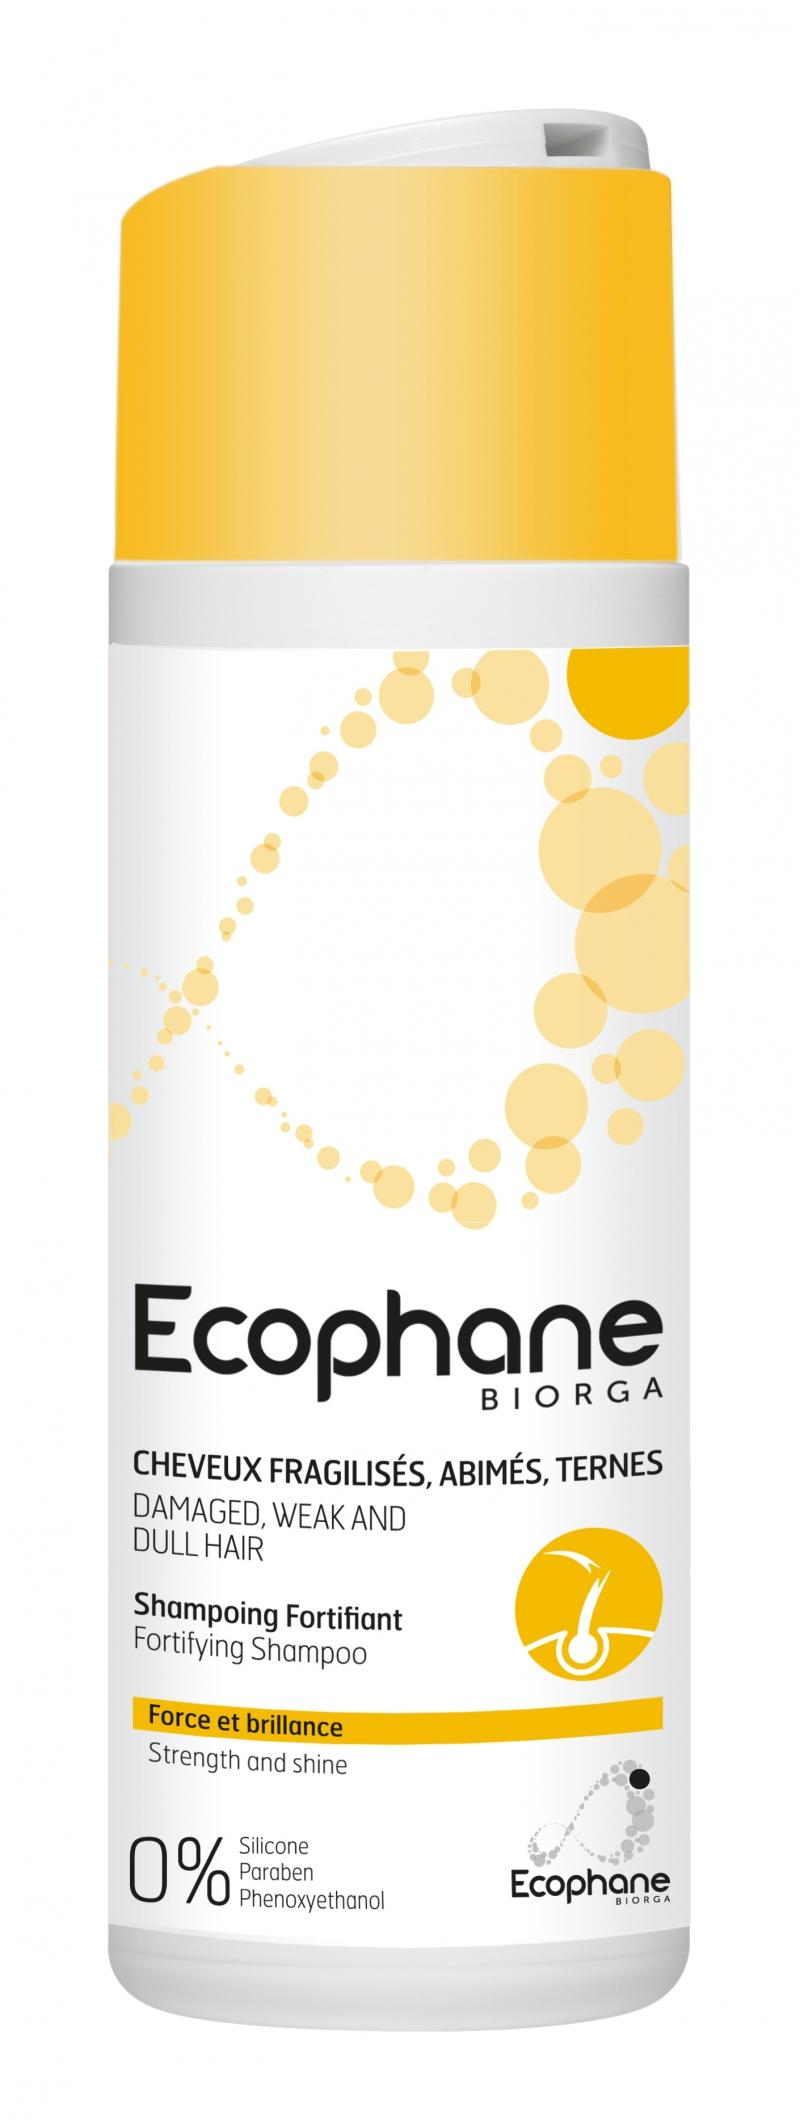 Biorga Экофан Укрепляющий шампунь 200 мл (Biorga, Ecophane)